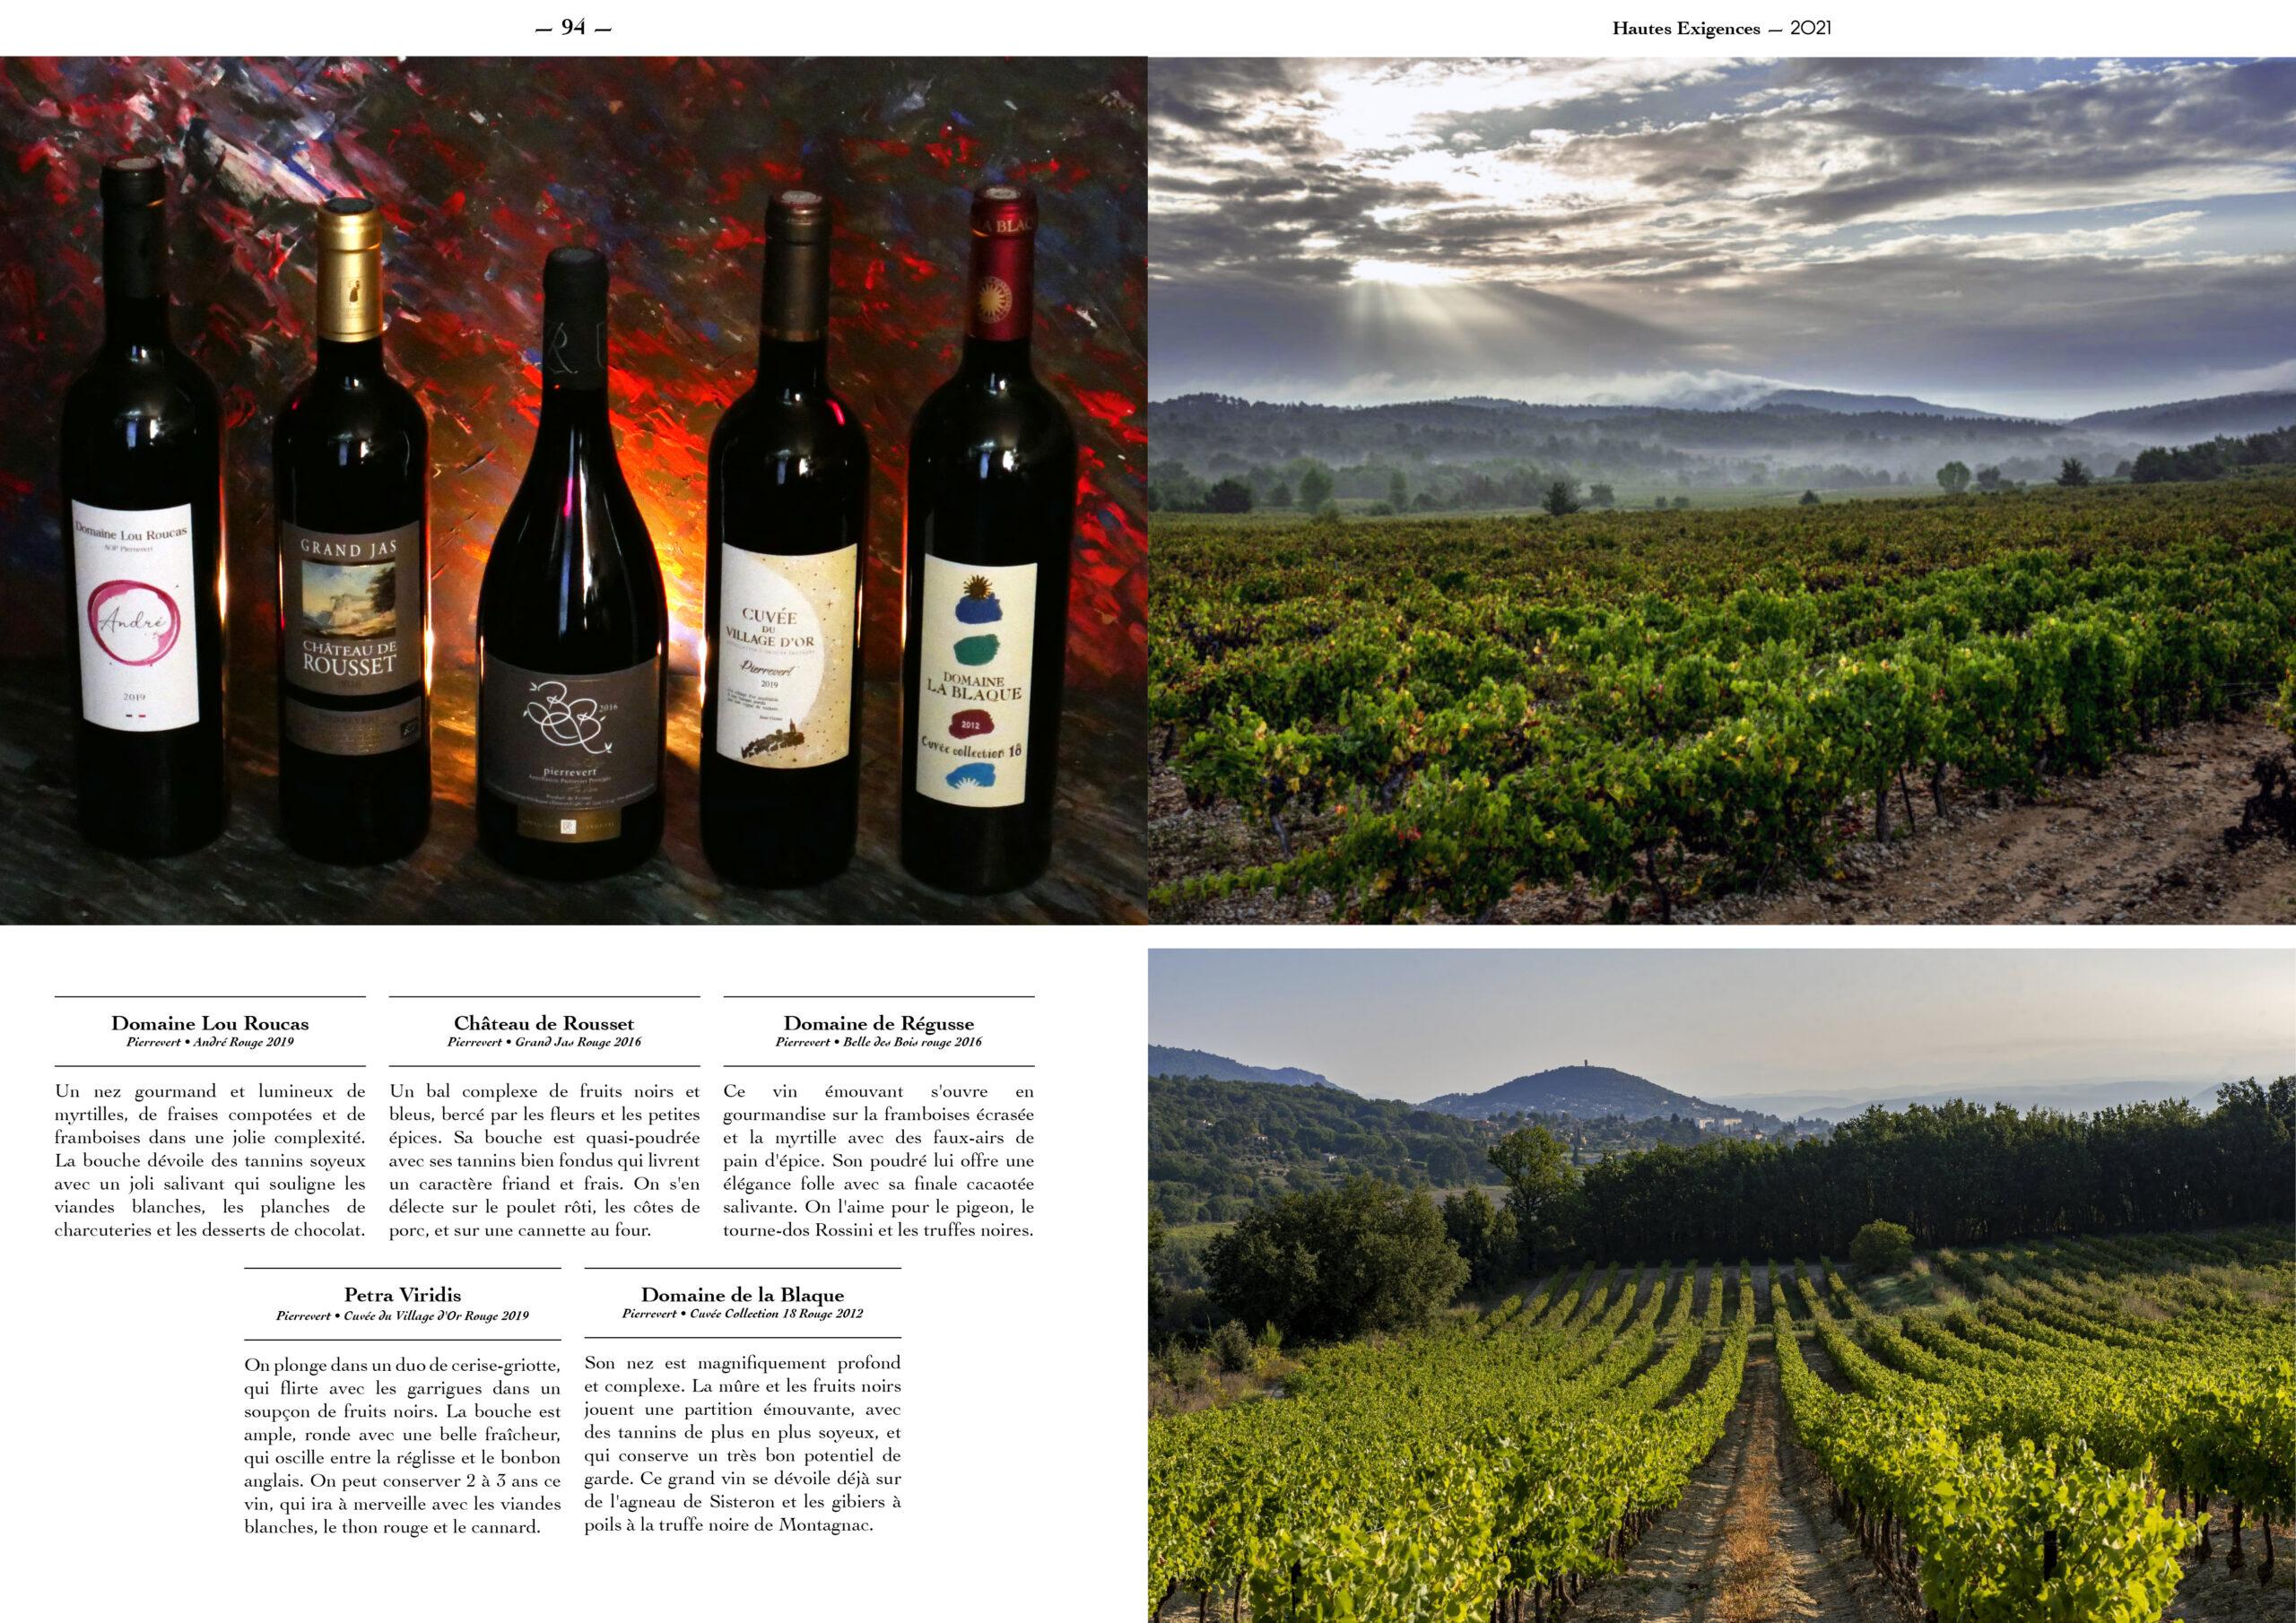 Hautes Exigences Magazine Hors Serie 2021 page 92-93